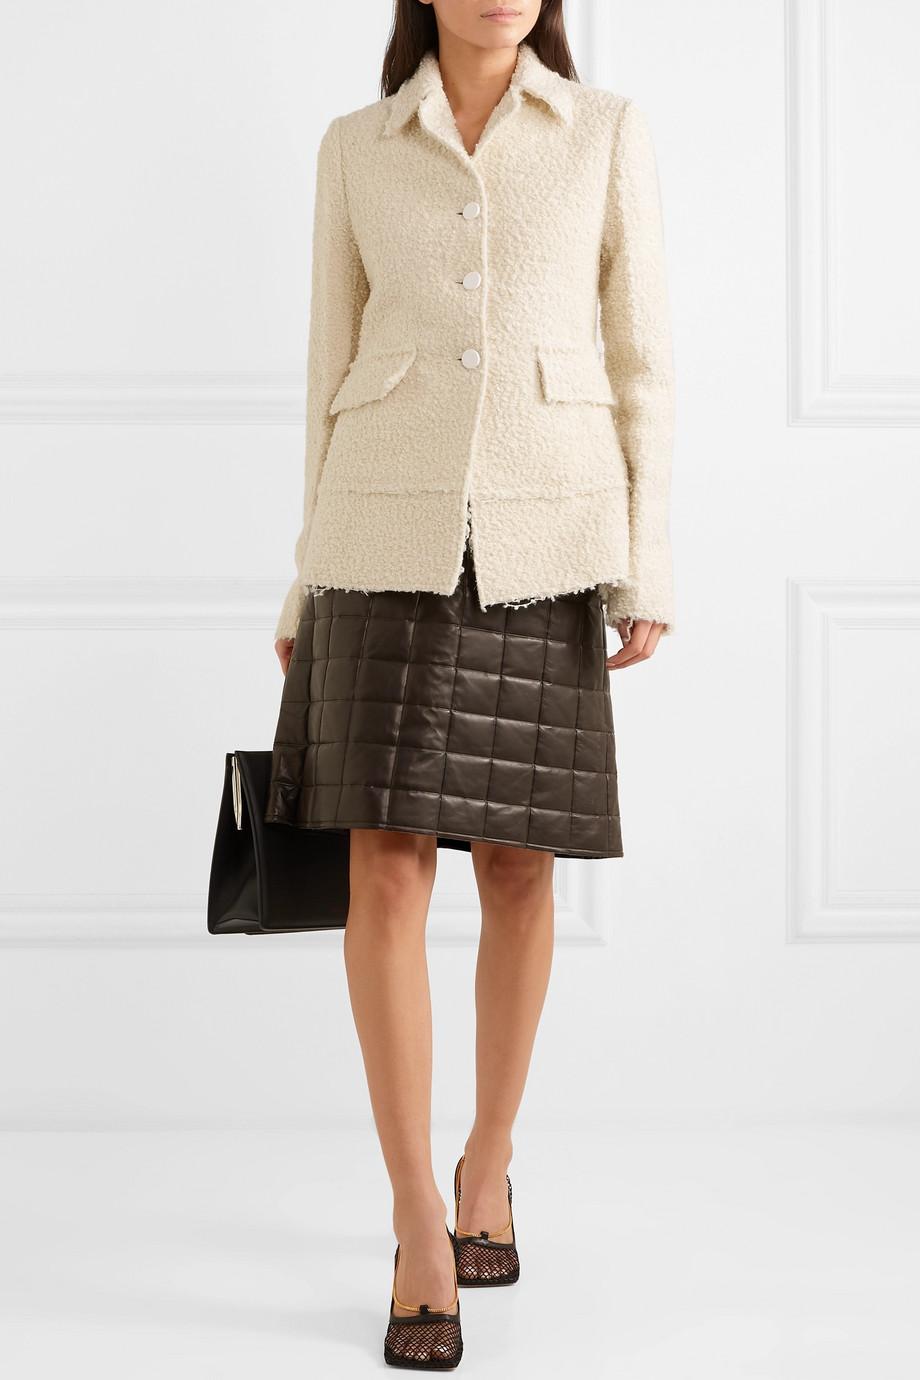 Bottega Veneta 圈圈呢外套